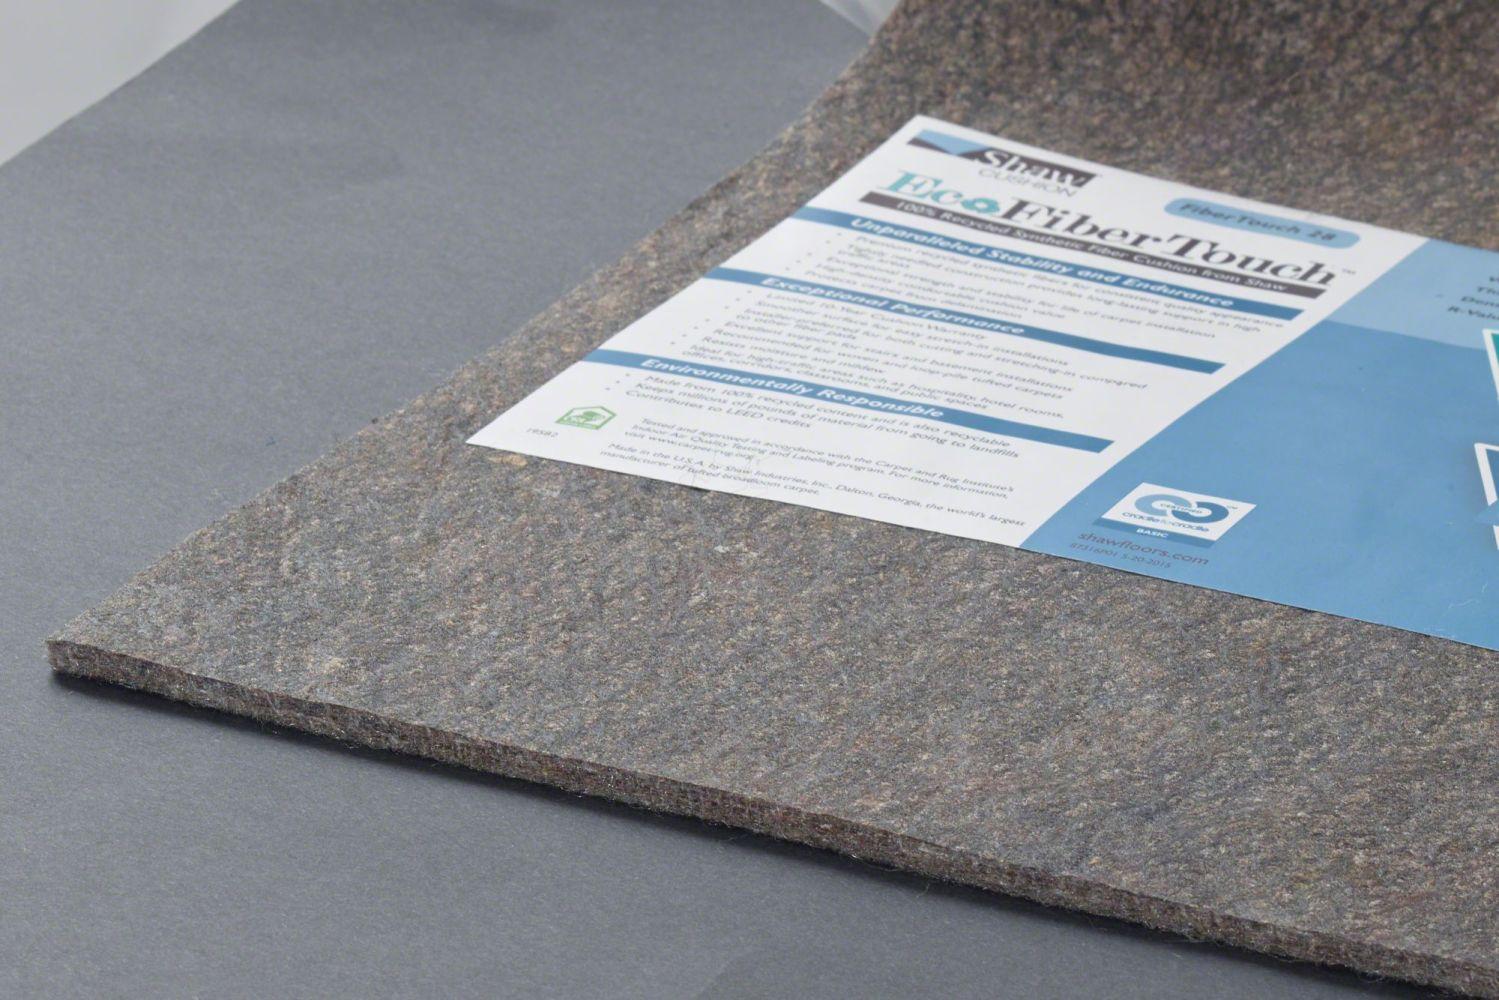 Shaw Floors Eco Edge Cushion Fibertouch 28-6 Grey 00001_280FT